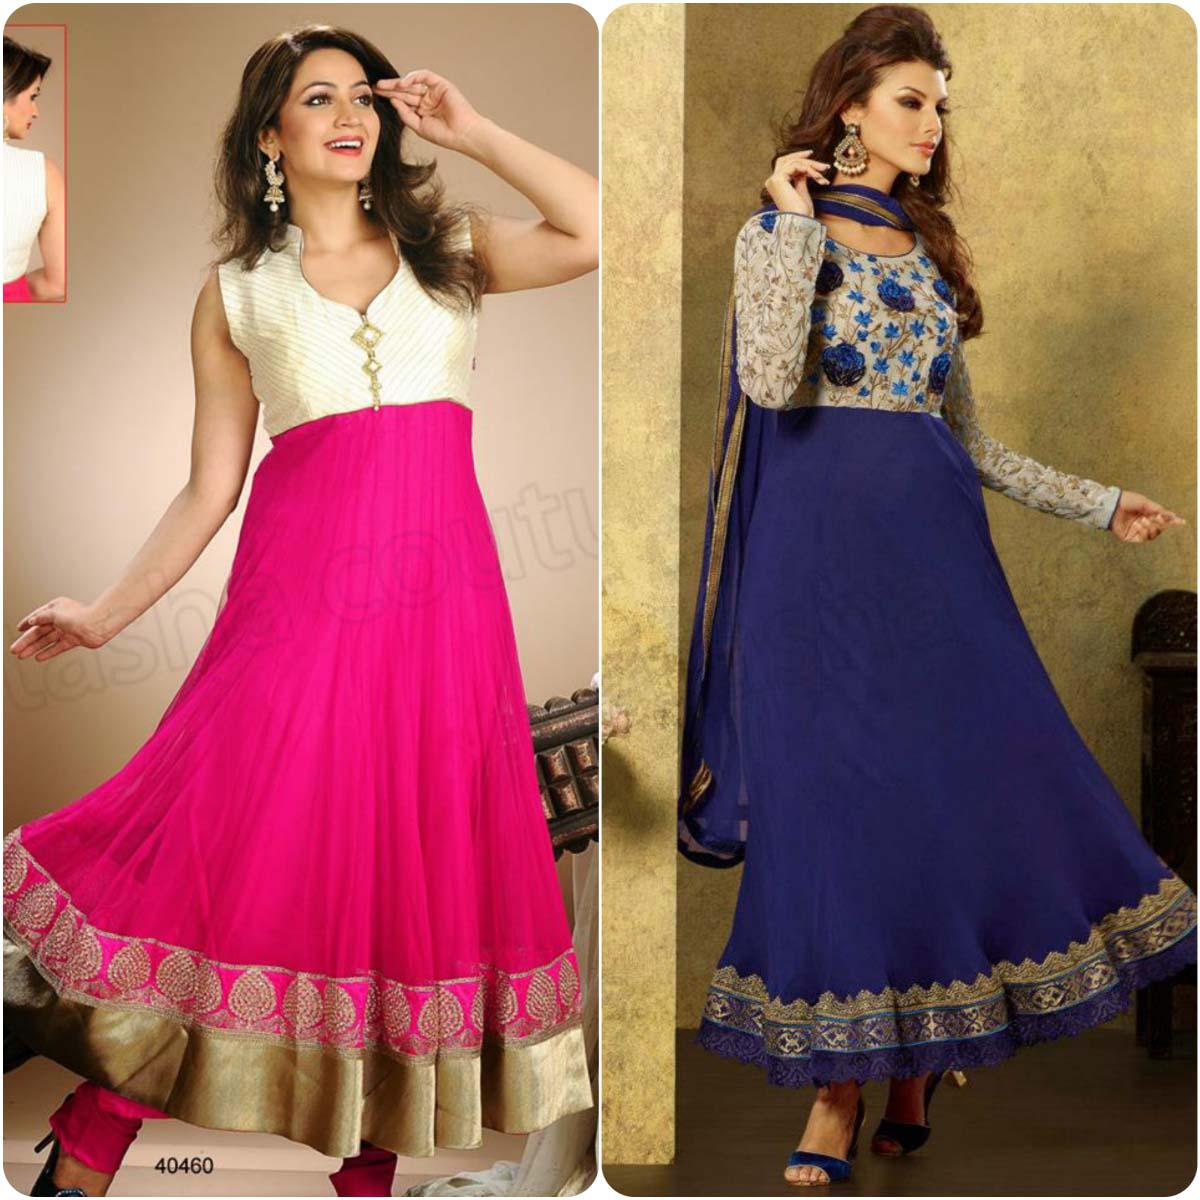 Natasha Couture Latest Indian Anarkali Dress Desigs Collection 2016-2017...styloplanet (13)